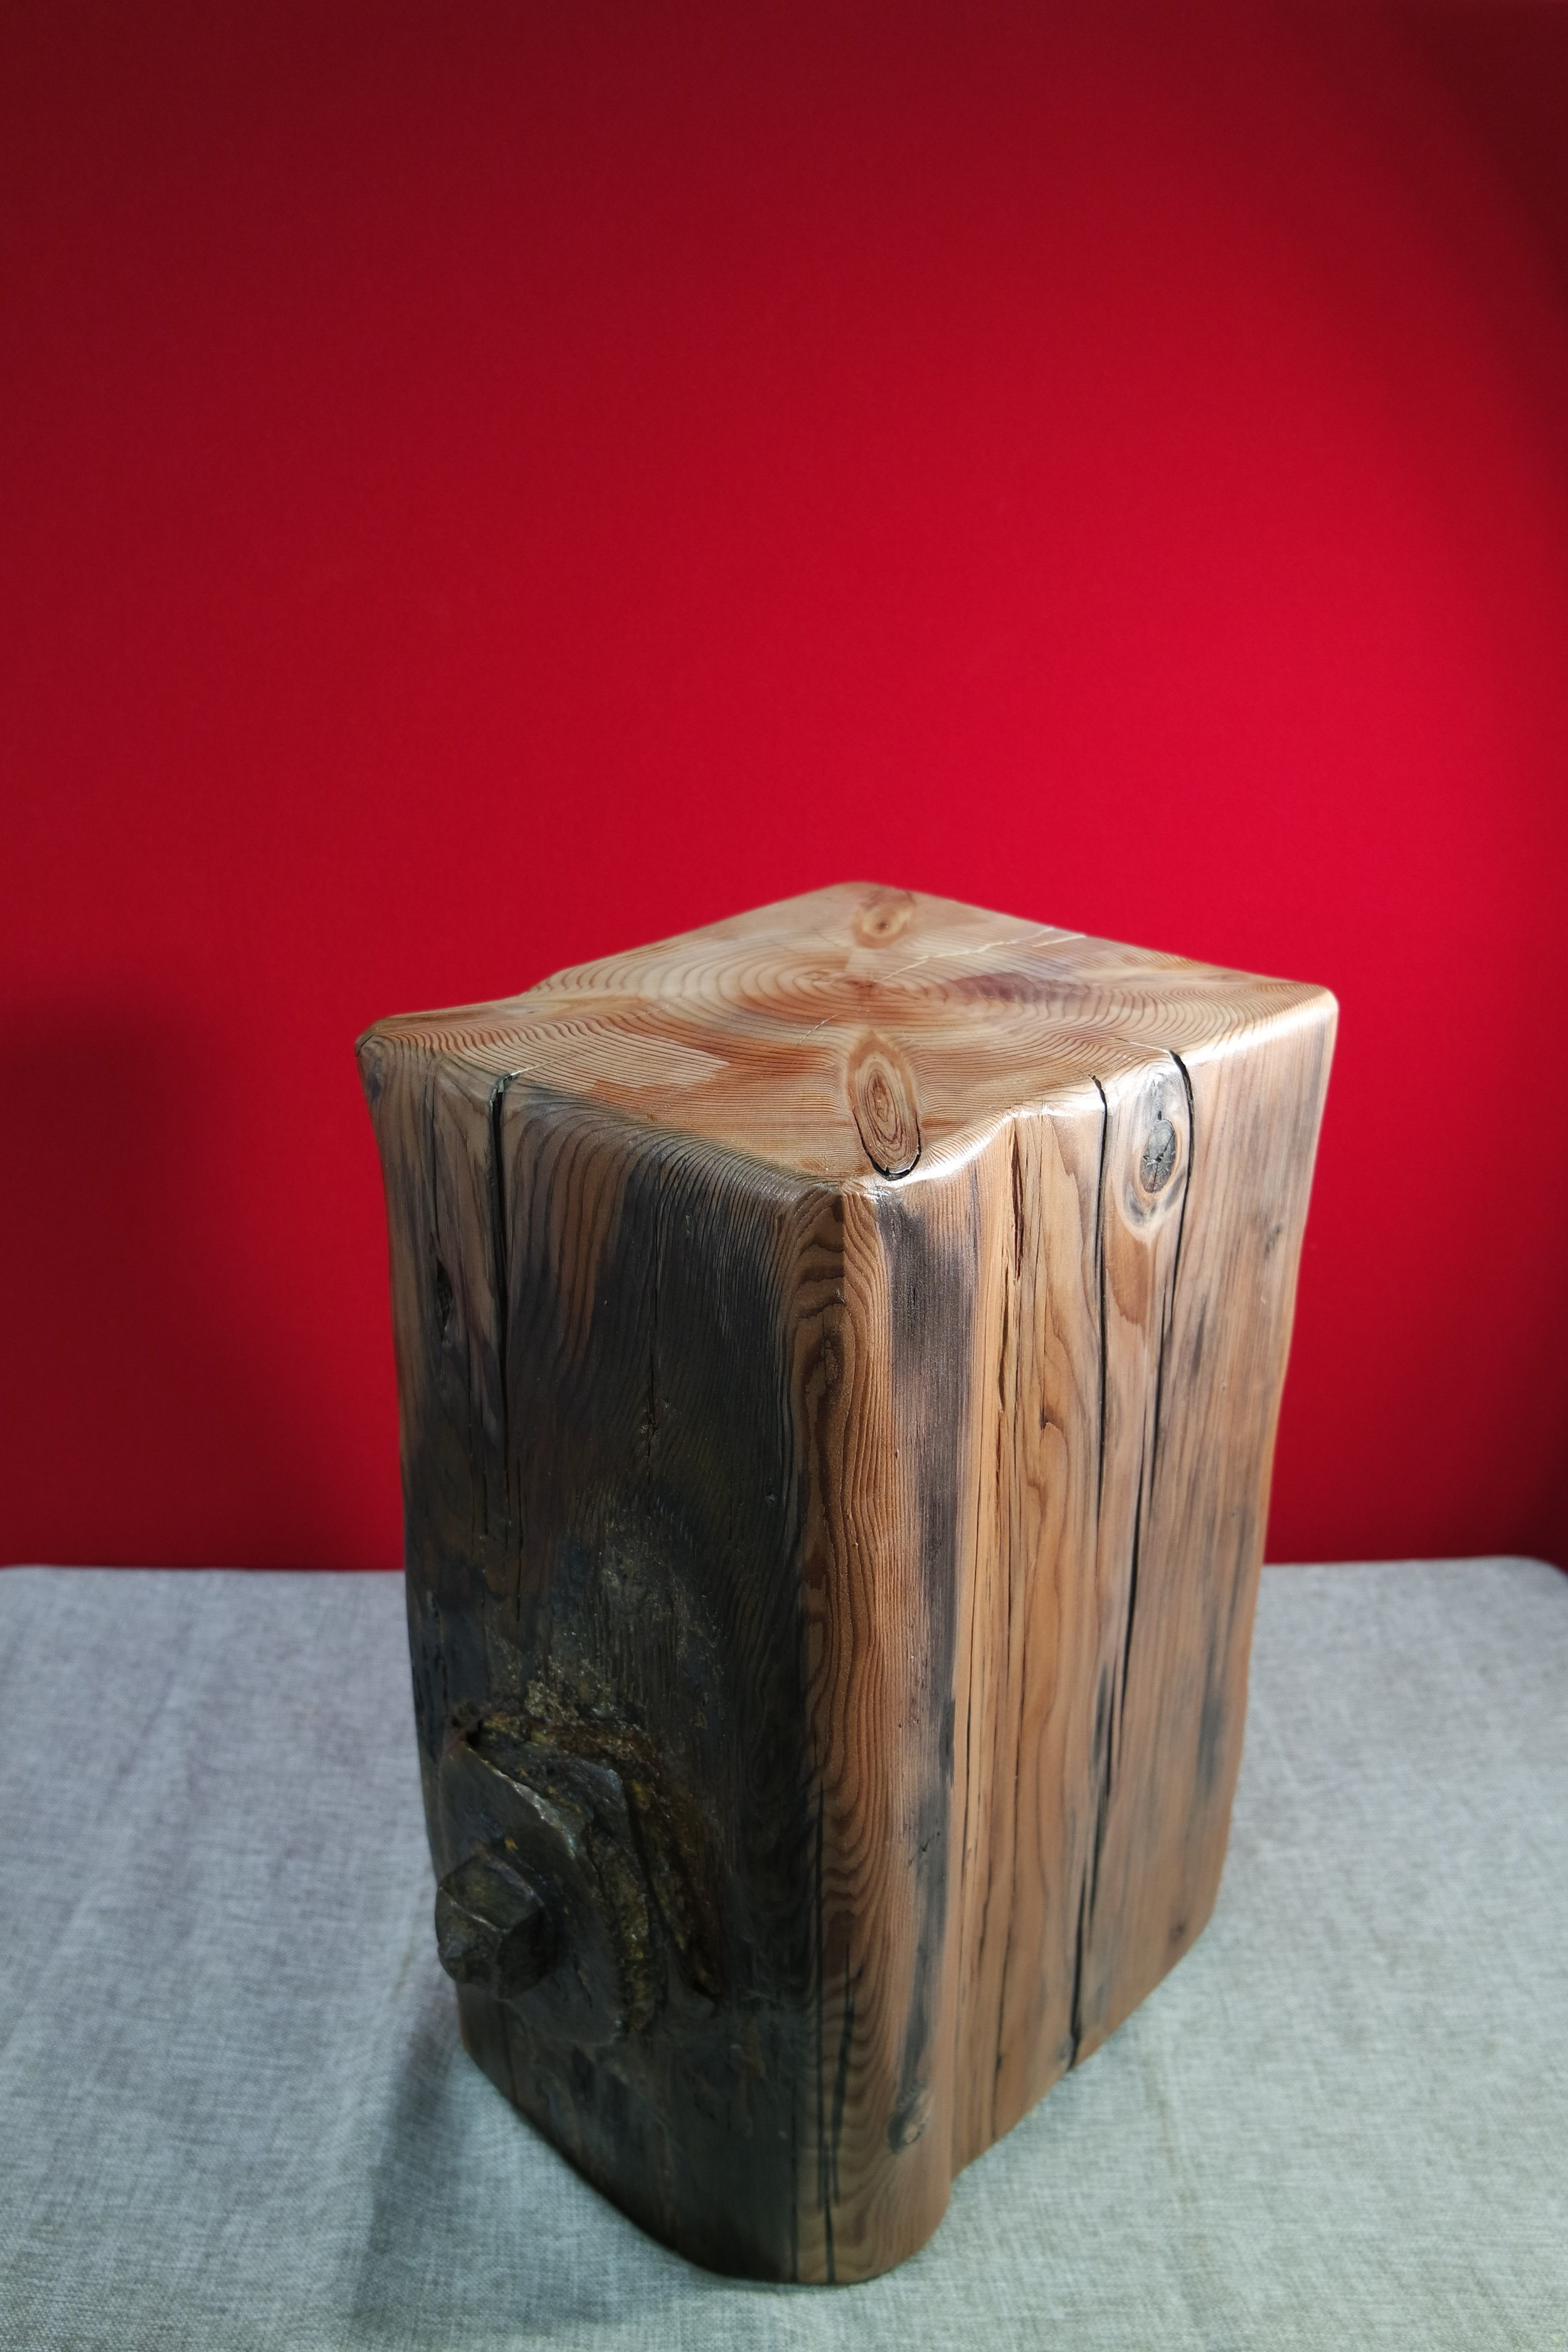 Driftwood Stool with Iron Bolt No I (24).JPG